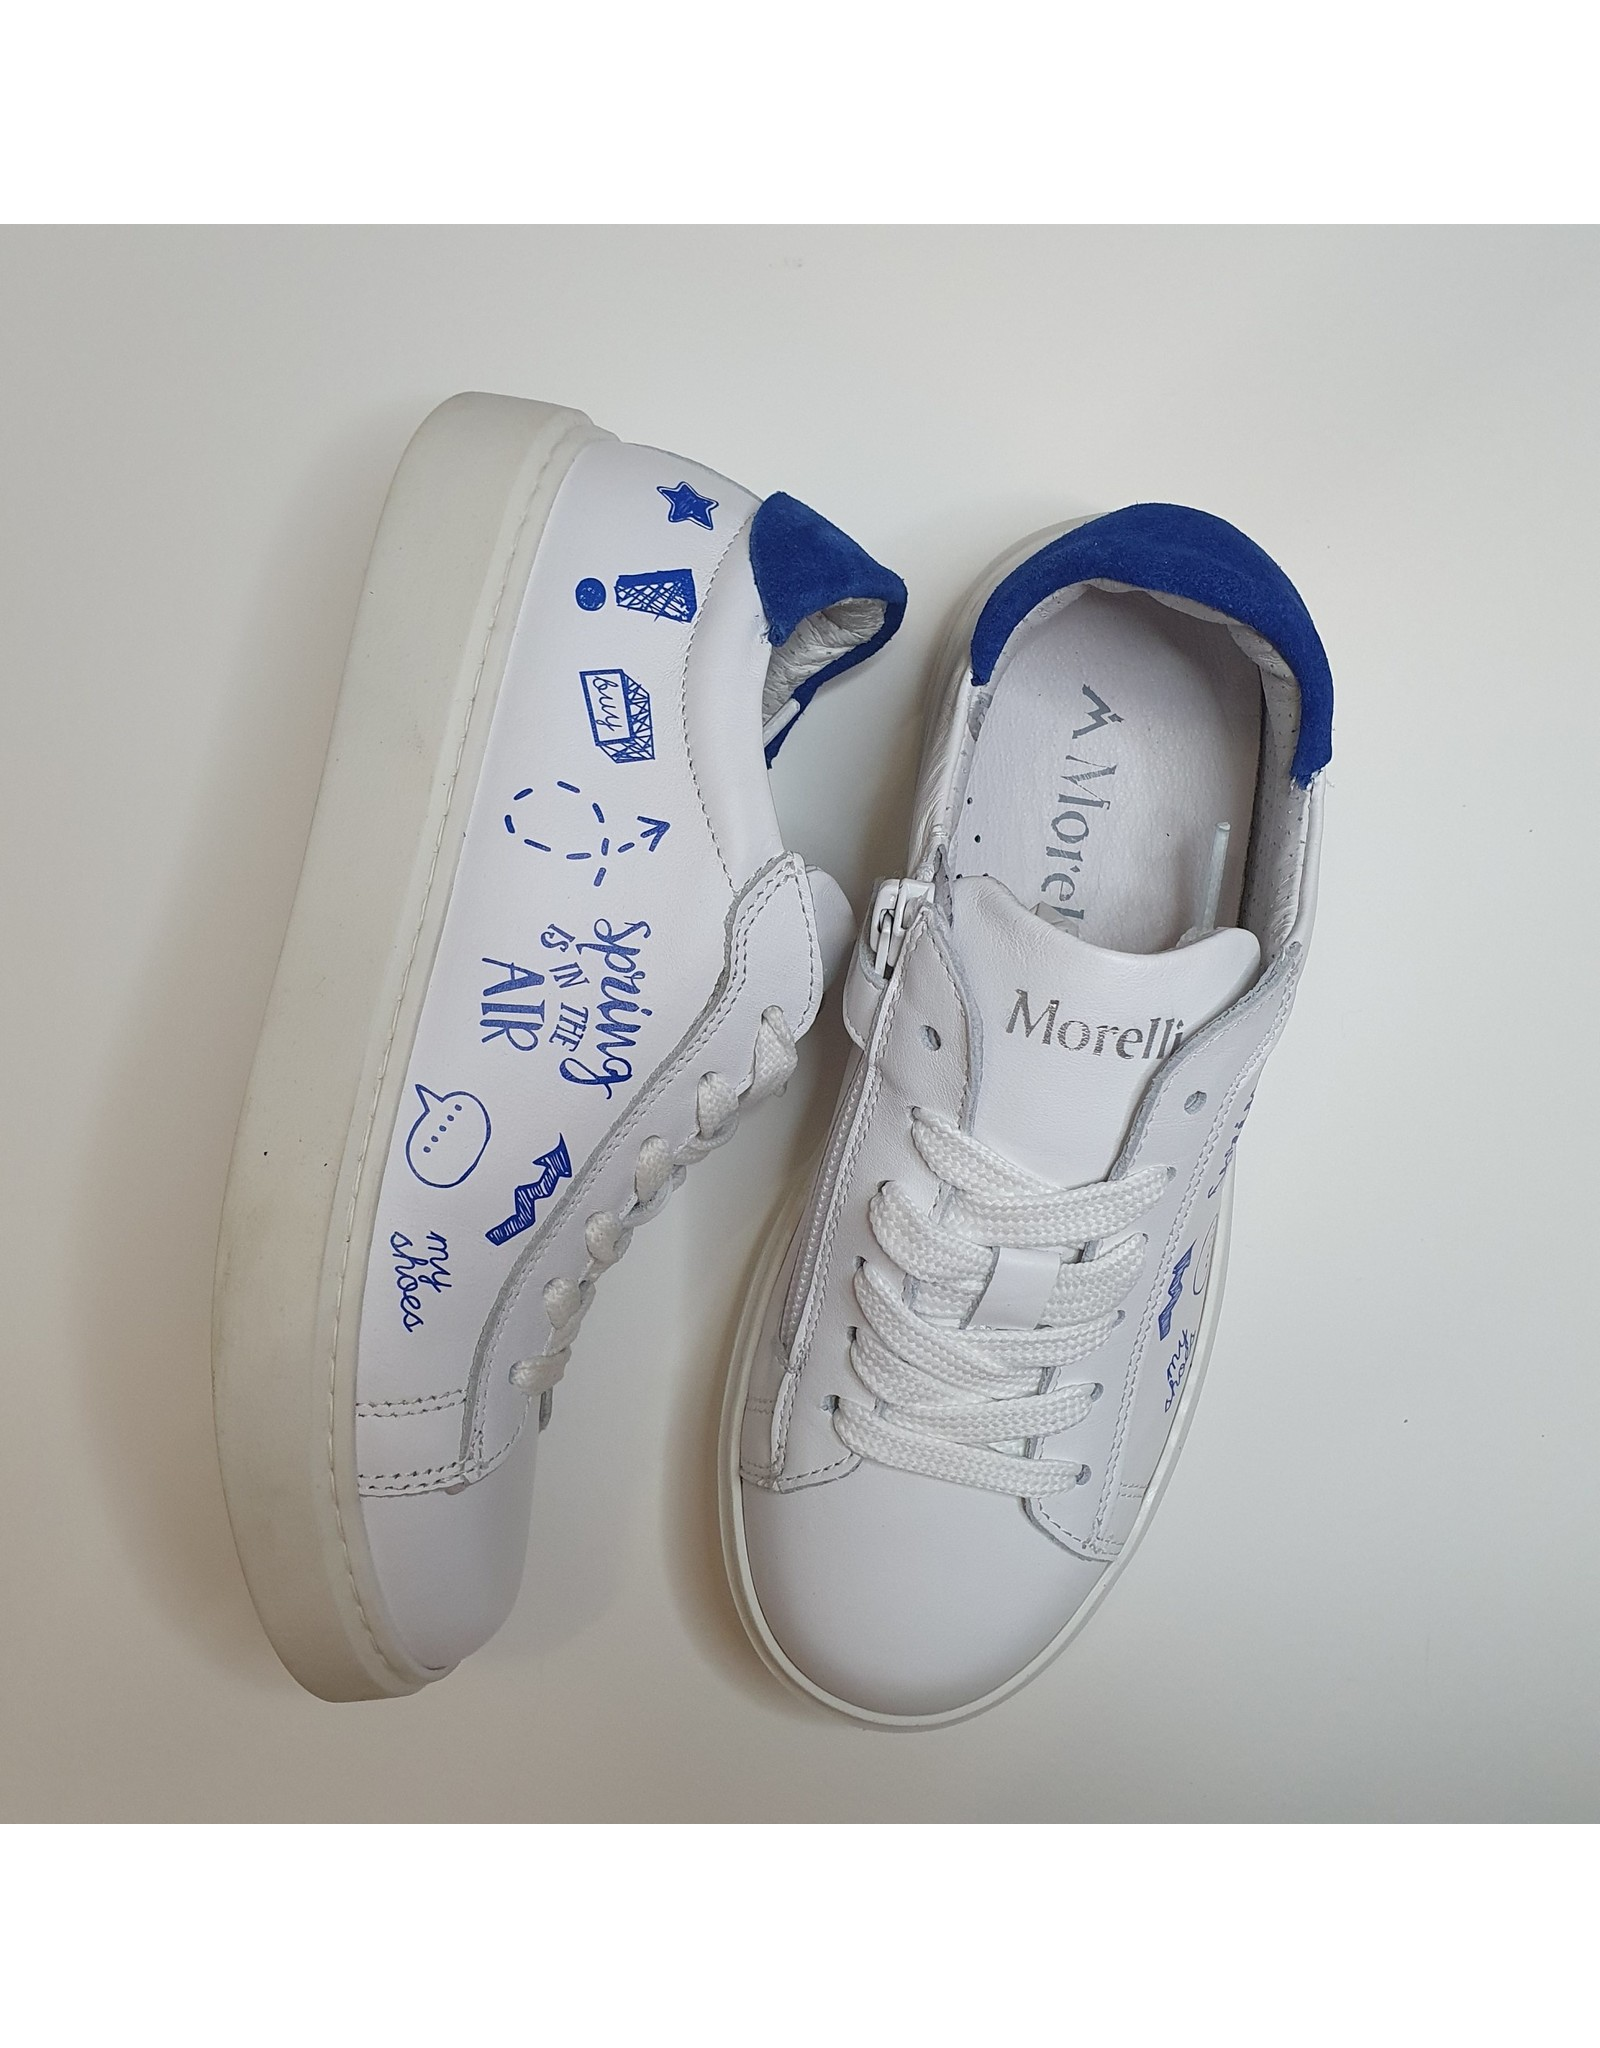 Andrea Morelli sneaker wit/ blauwe tekst